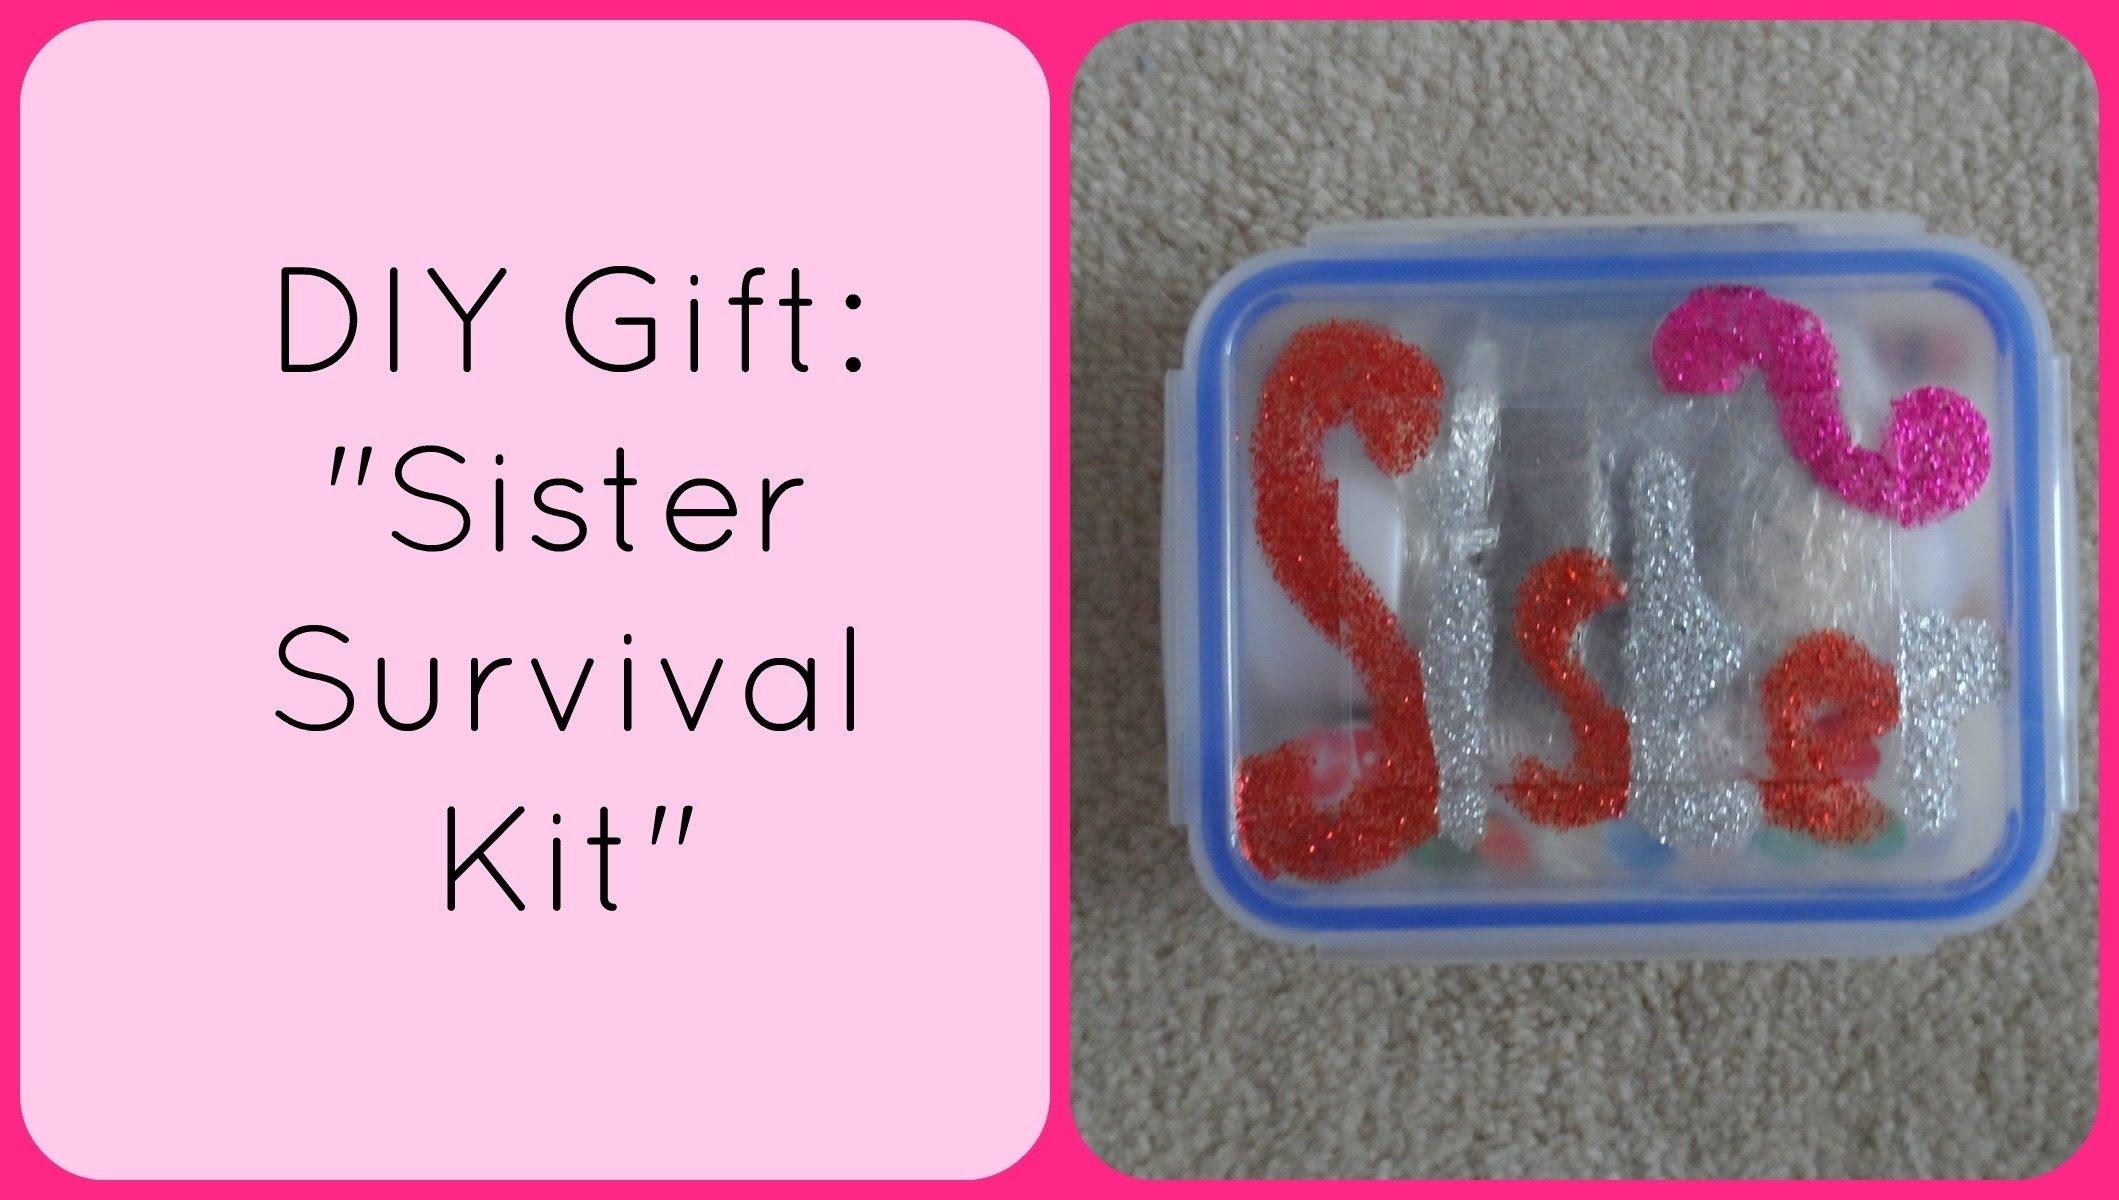 10 Gorgeous Birthday Gift Ideas For Sister diy christmas gift sister survival kit accentgirl100 youtube 2021